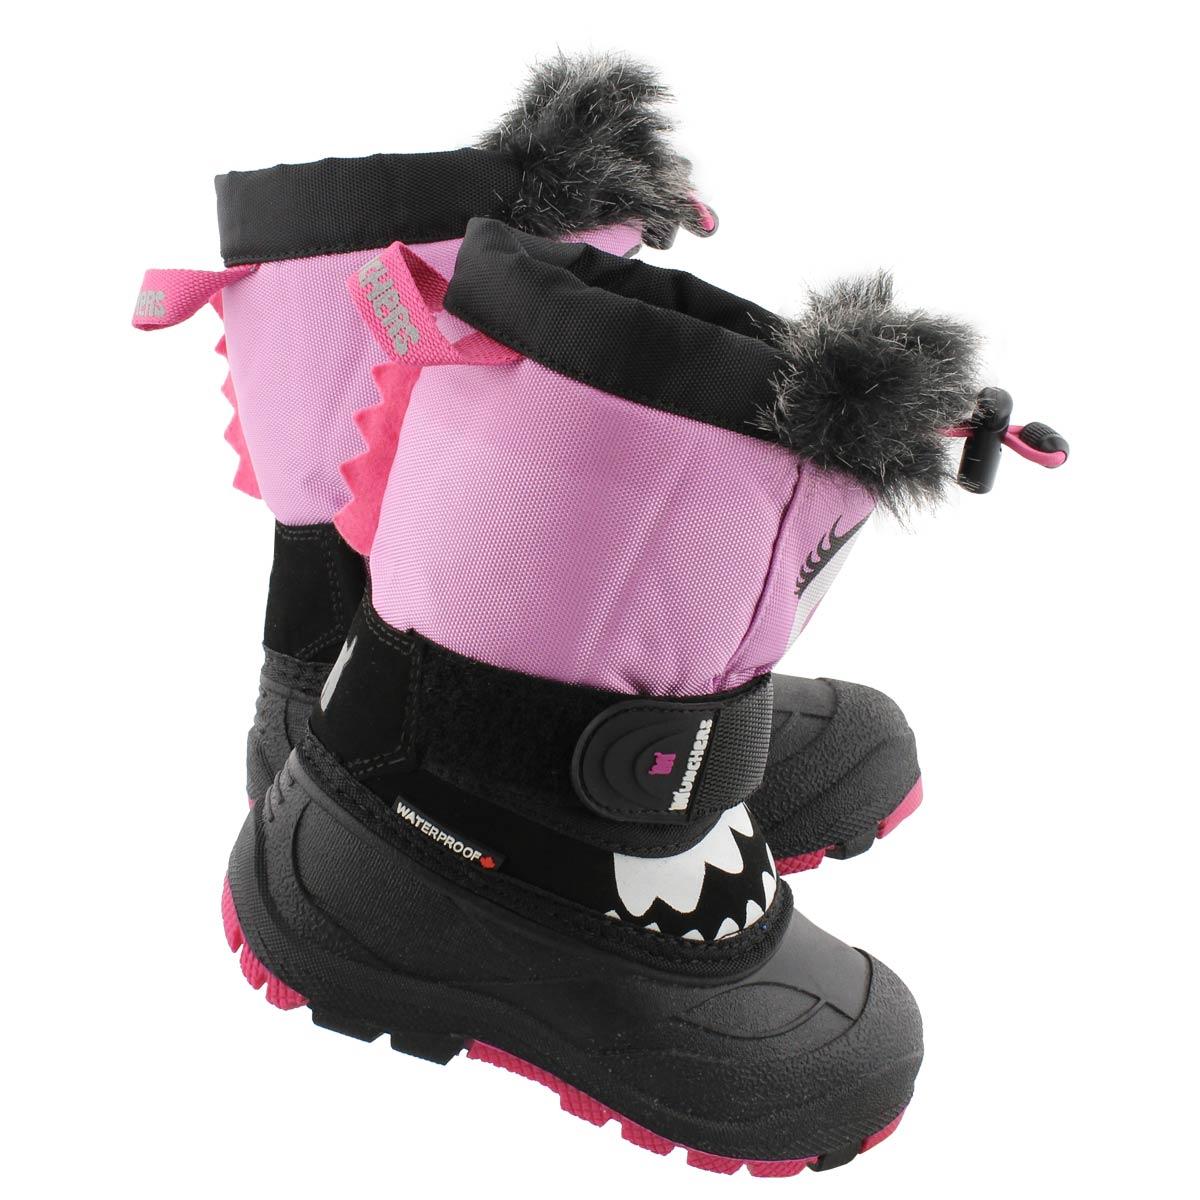 Bottes d'hiver MaxEye noir/rose, filles